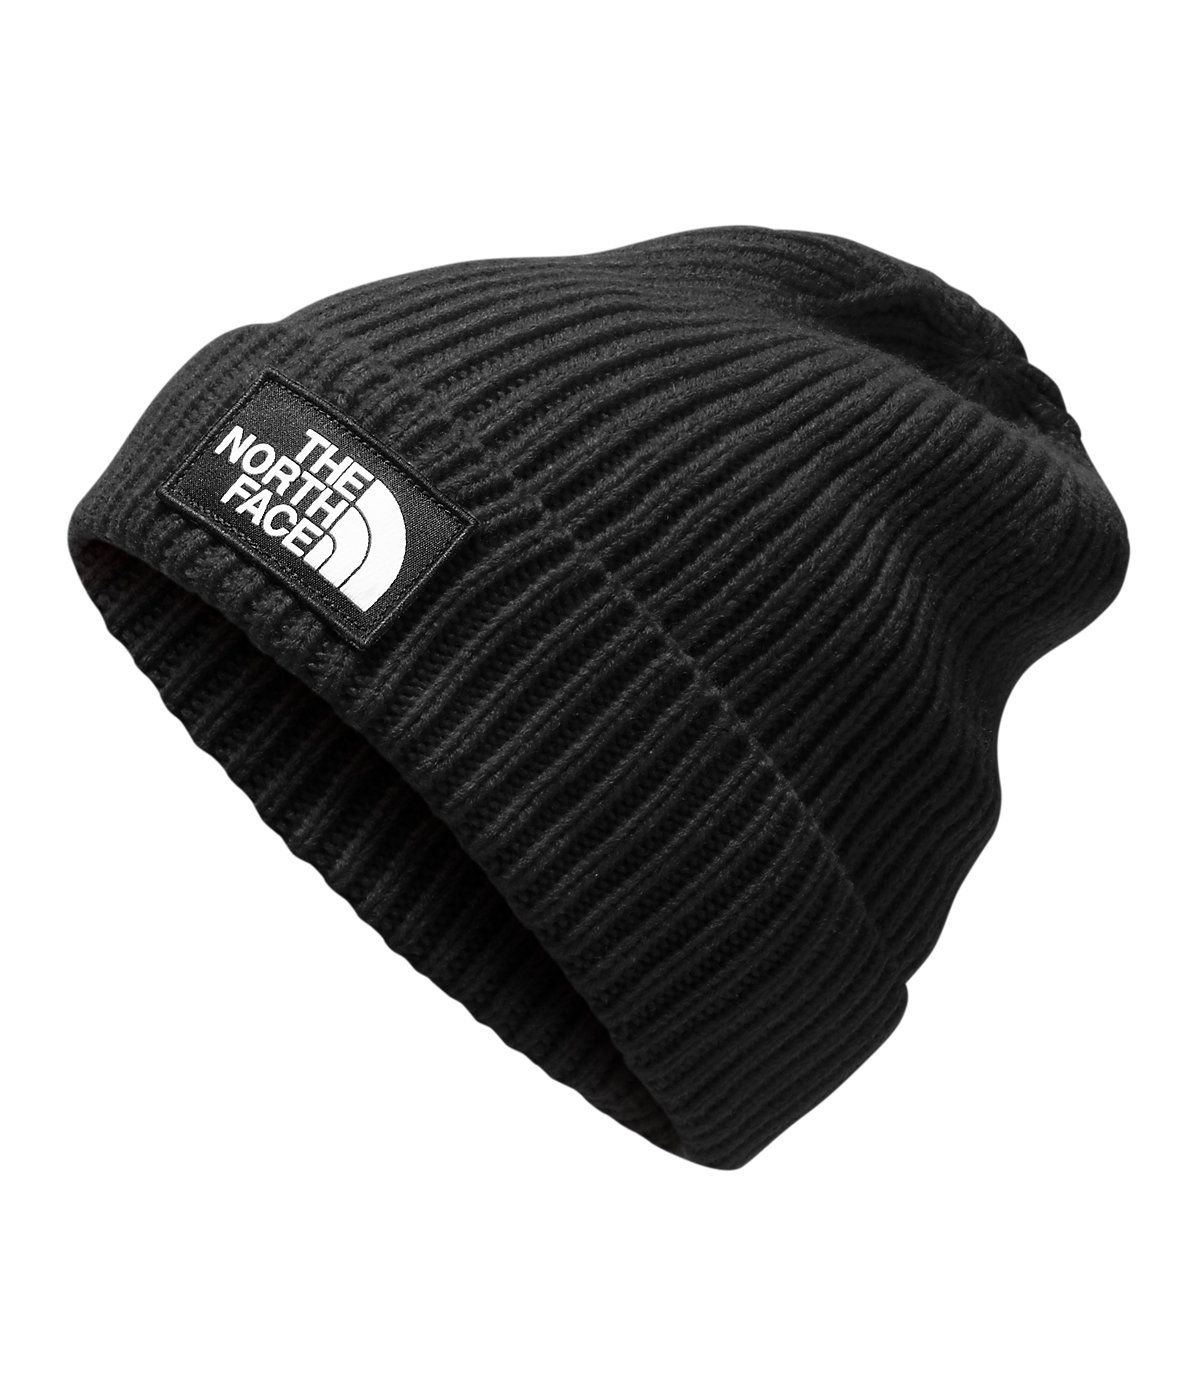 d57b20455 The North Face Men's TNF Logo Box Cuffed Beanie Hat in 2019 ...